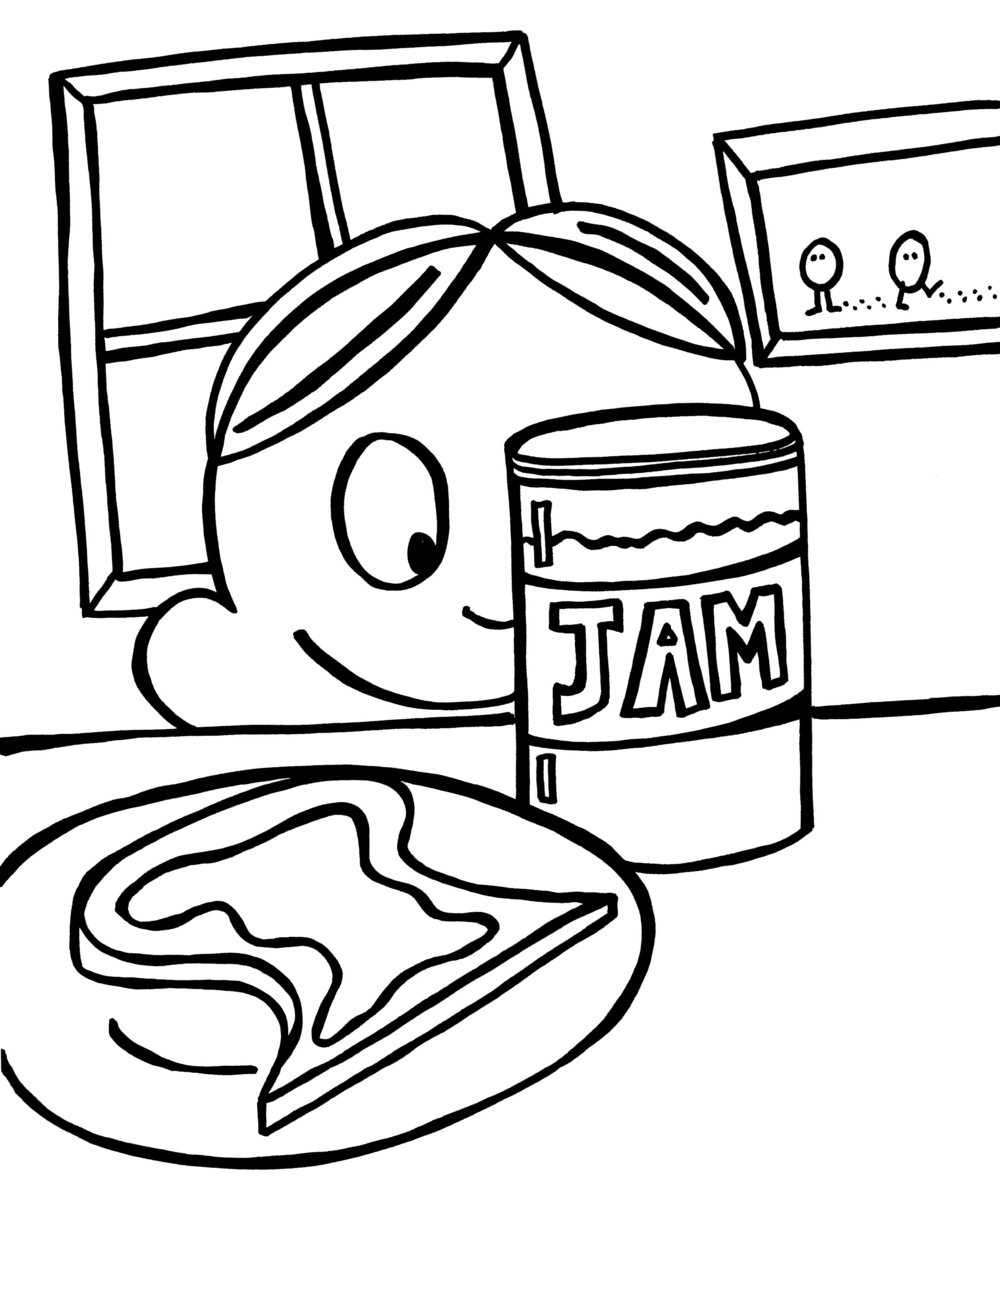 J_Jam.jpg